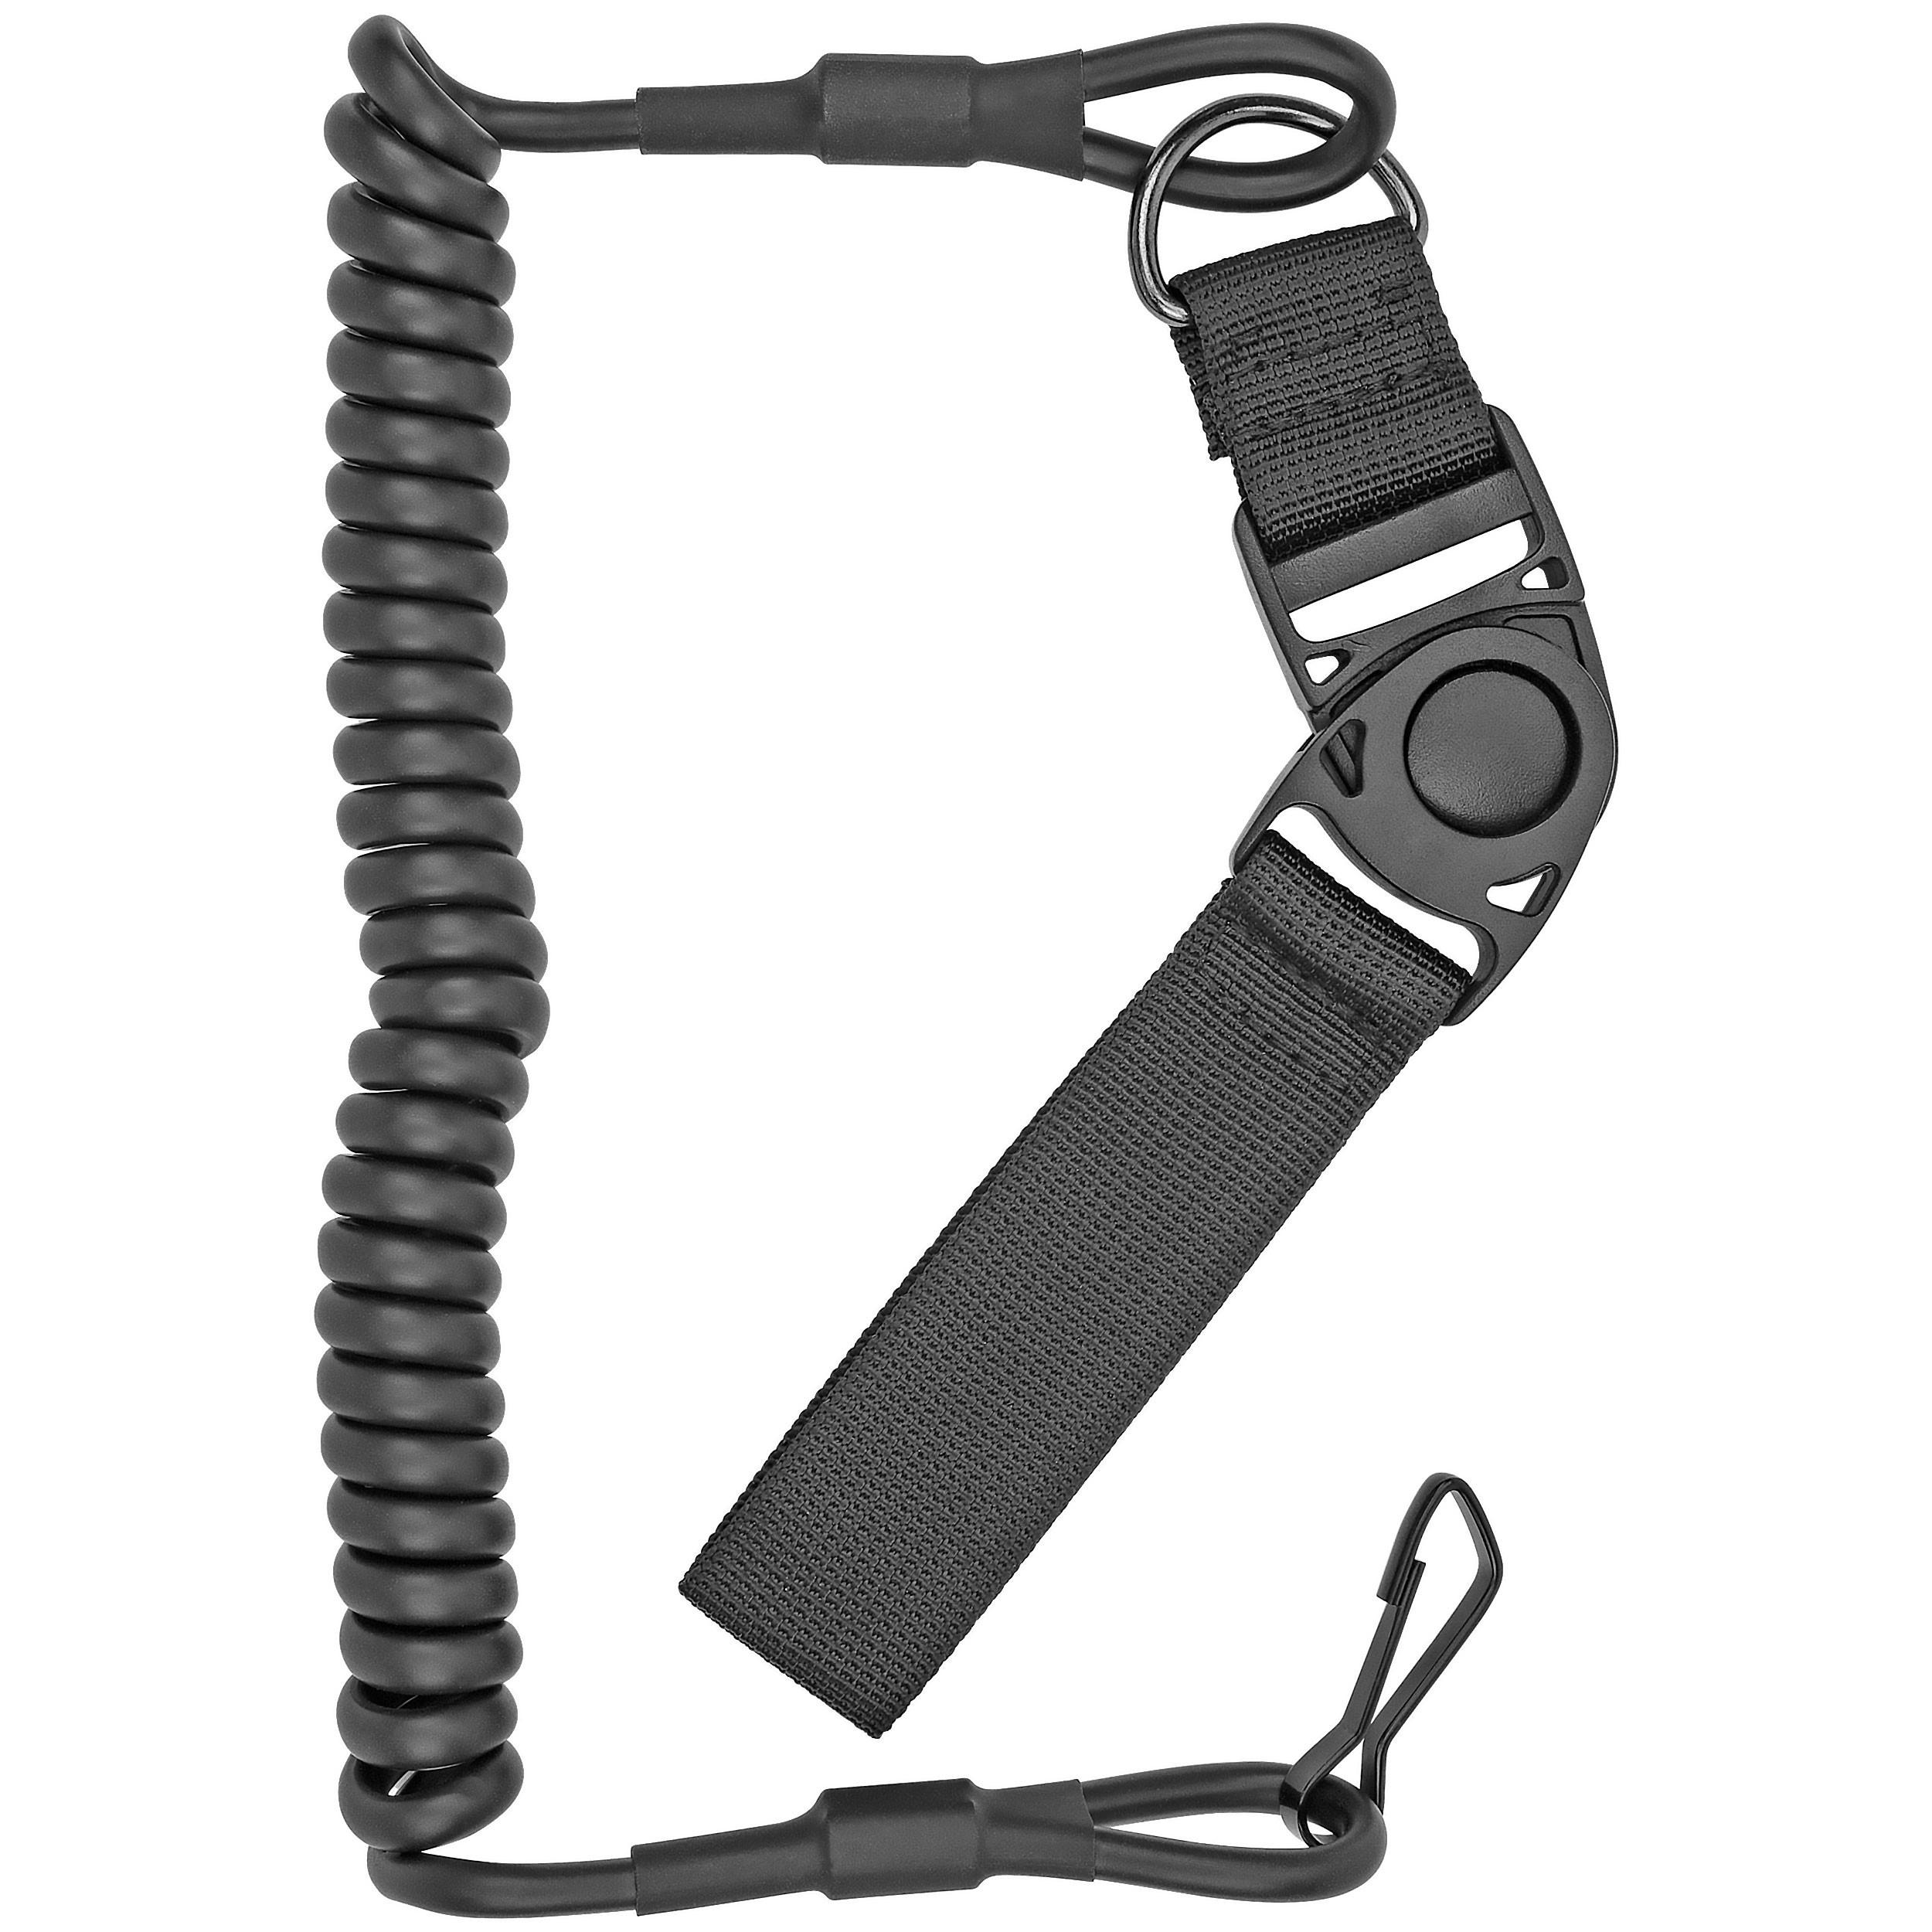 Boomstick Gun Accessories Tactical Pistol Lanyard, Black